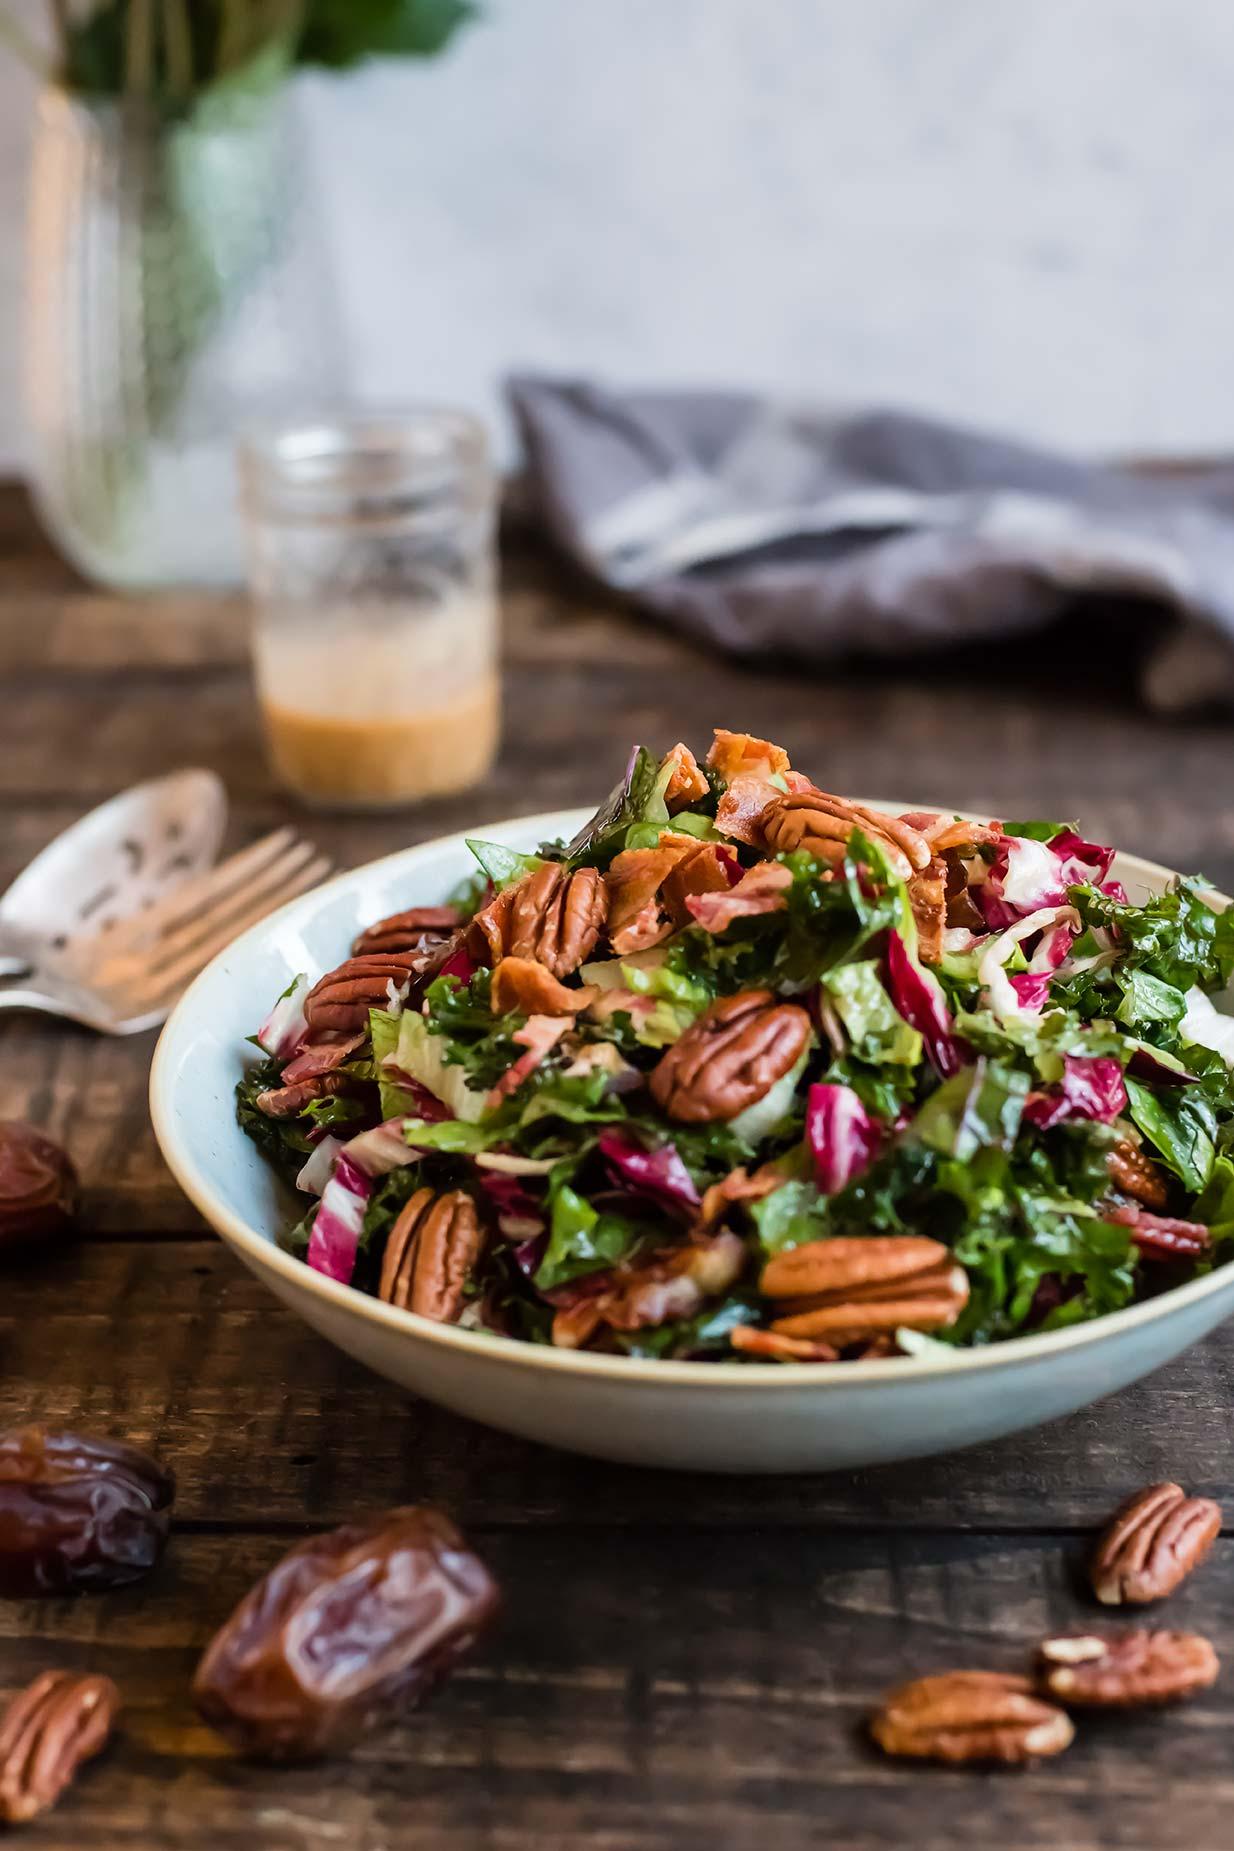 Chopped Kale Salad with Bacon, Dates & Kale